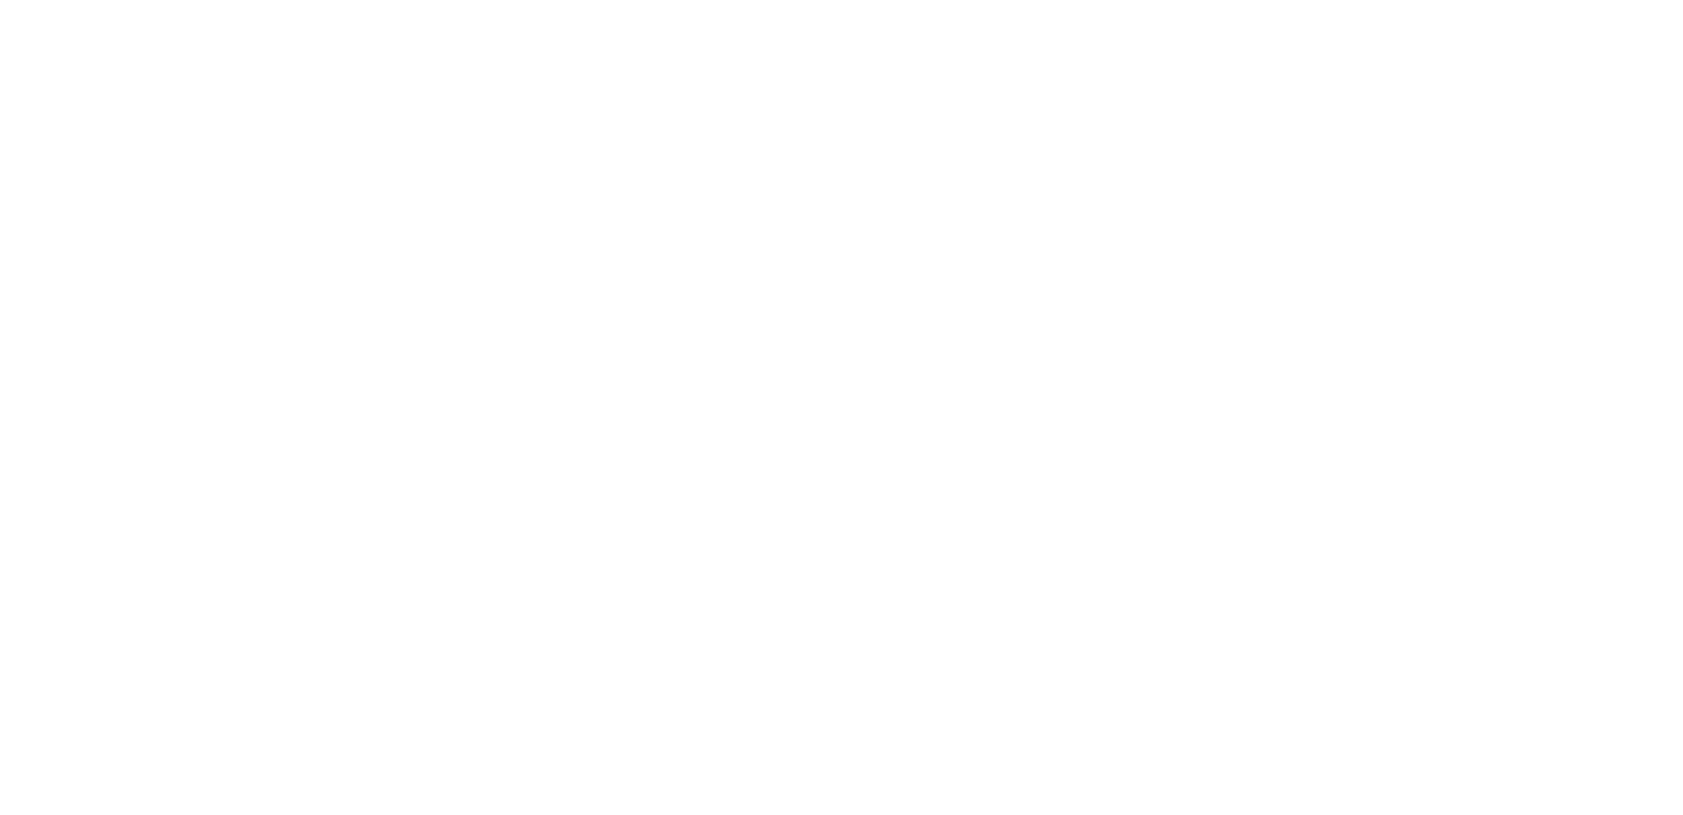 COWYN_Tagline_White_RGB_300dpi.png